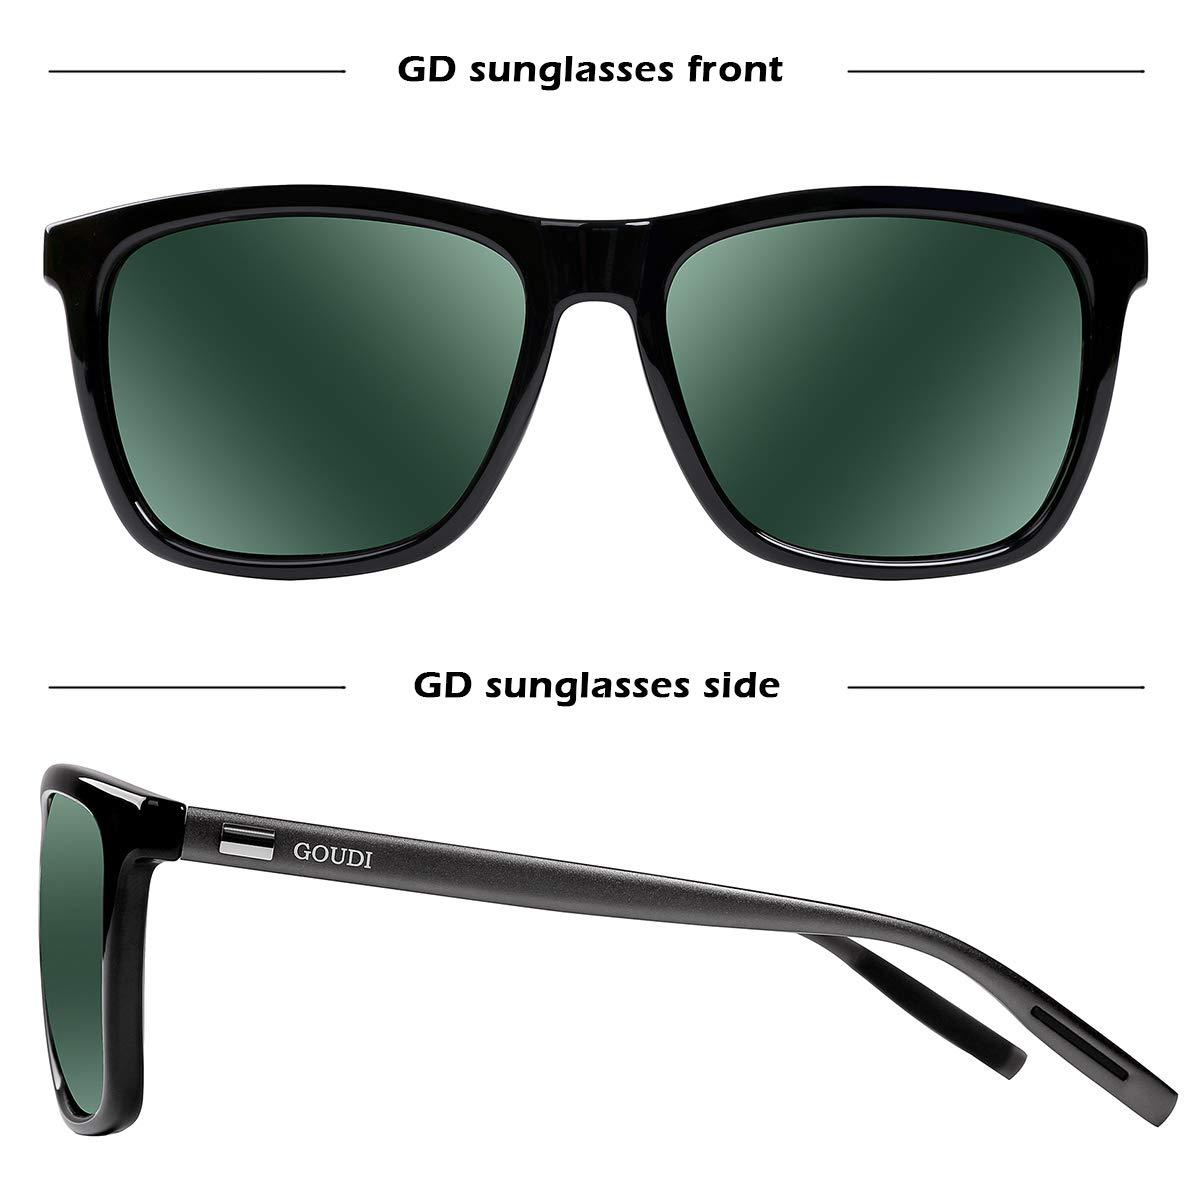 dc21e9c51b6 Polarized Wayfarer Sunglasses For Men -GOUDI Vintage Men Women Sunglasses Al -Mg Metal Frame